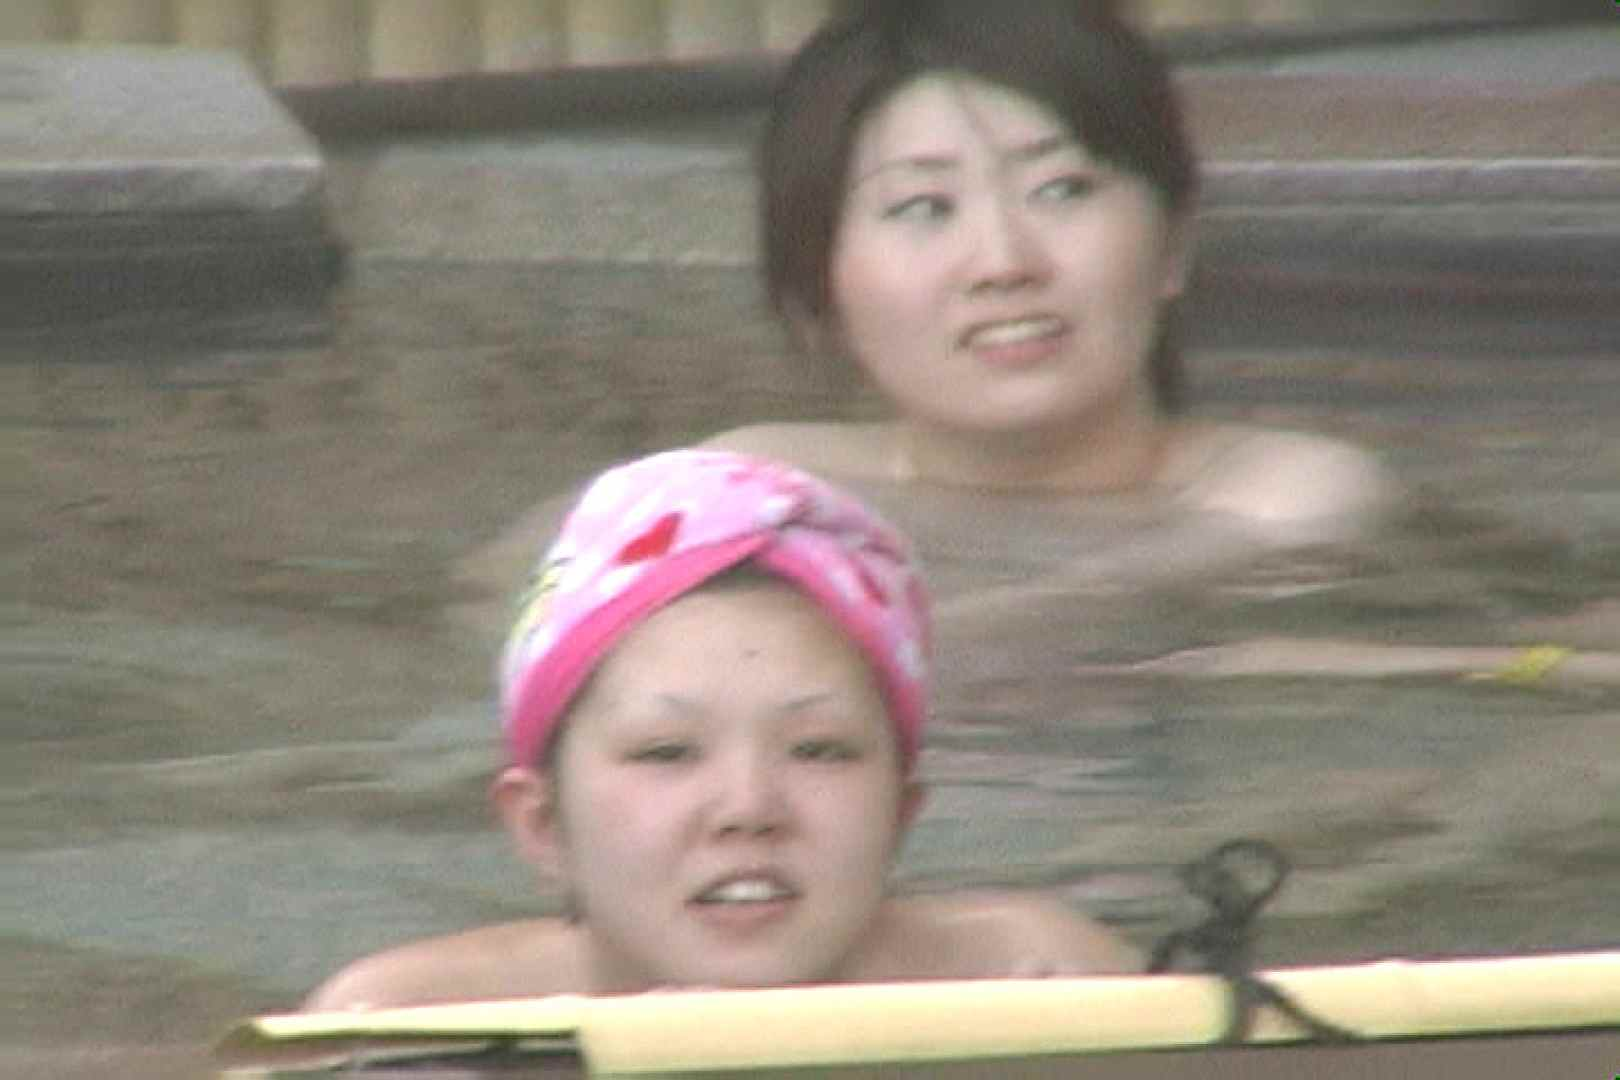 Aquaな露天風呂Vol.25 露天風呂編 | 盗撮シリーズ  91PIX 51